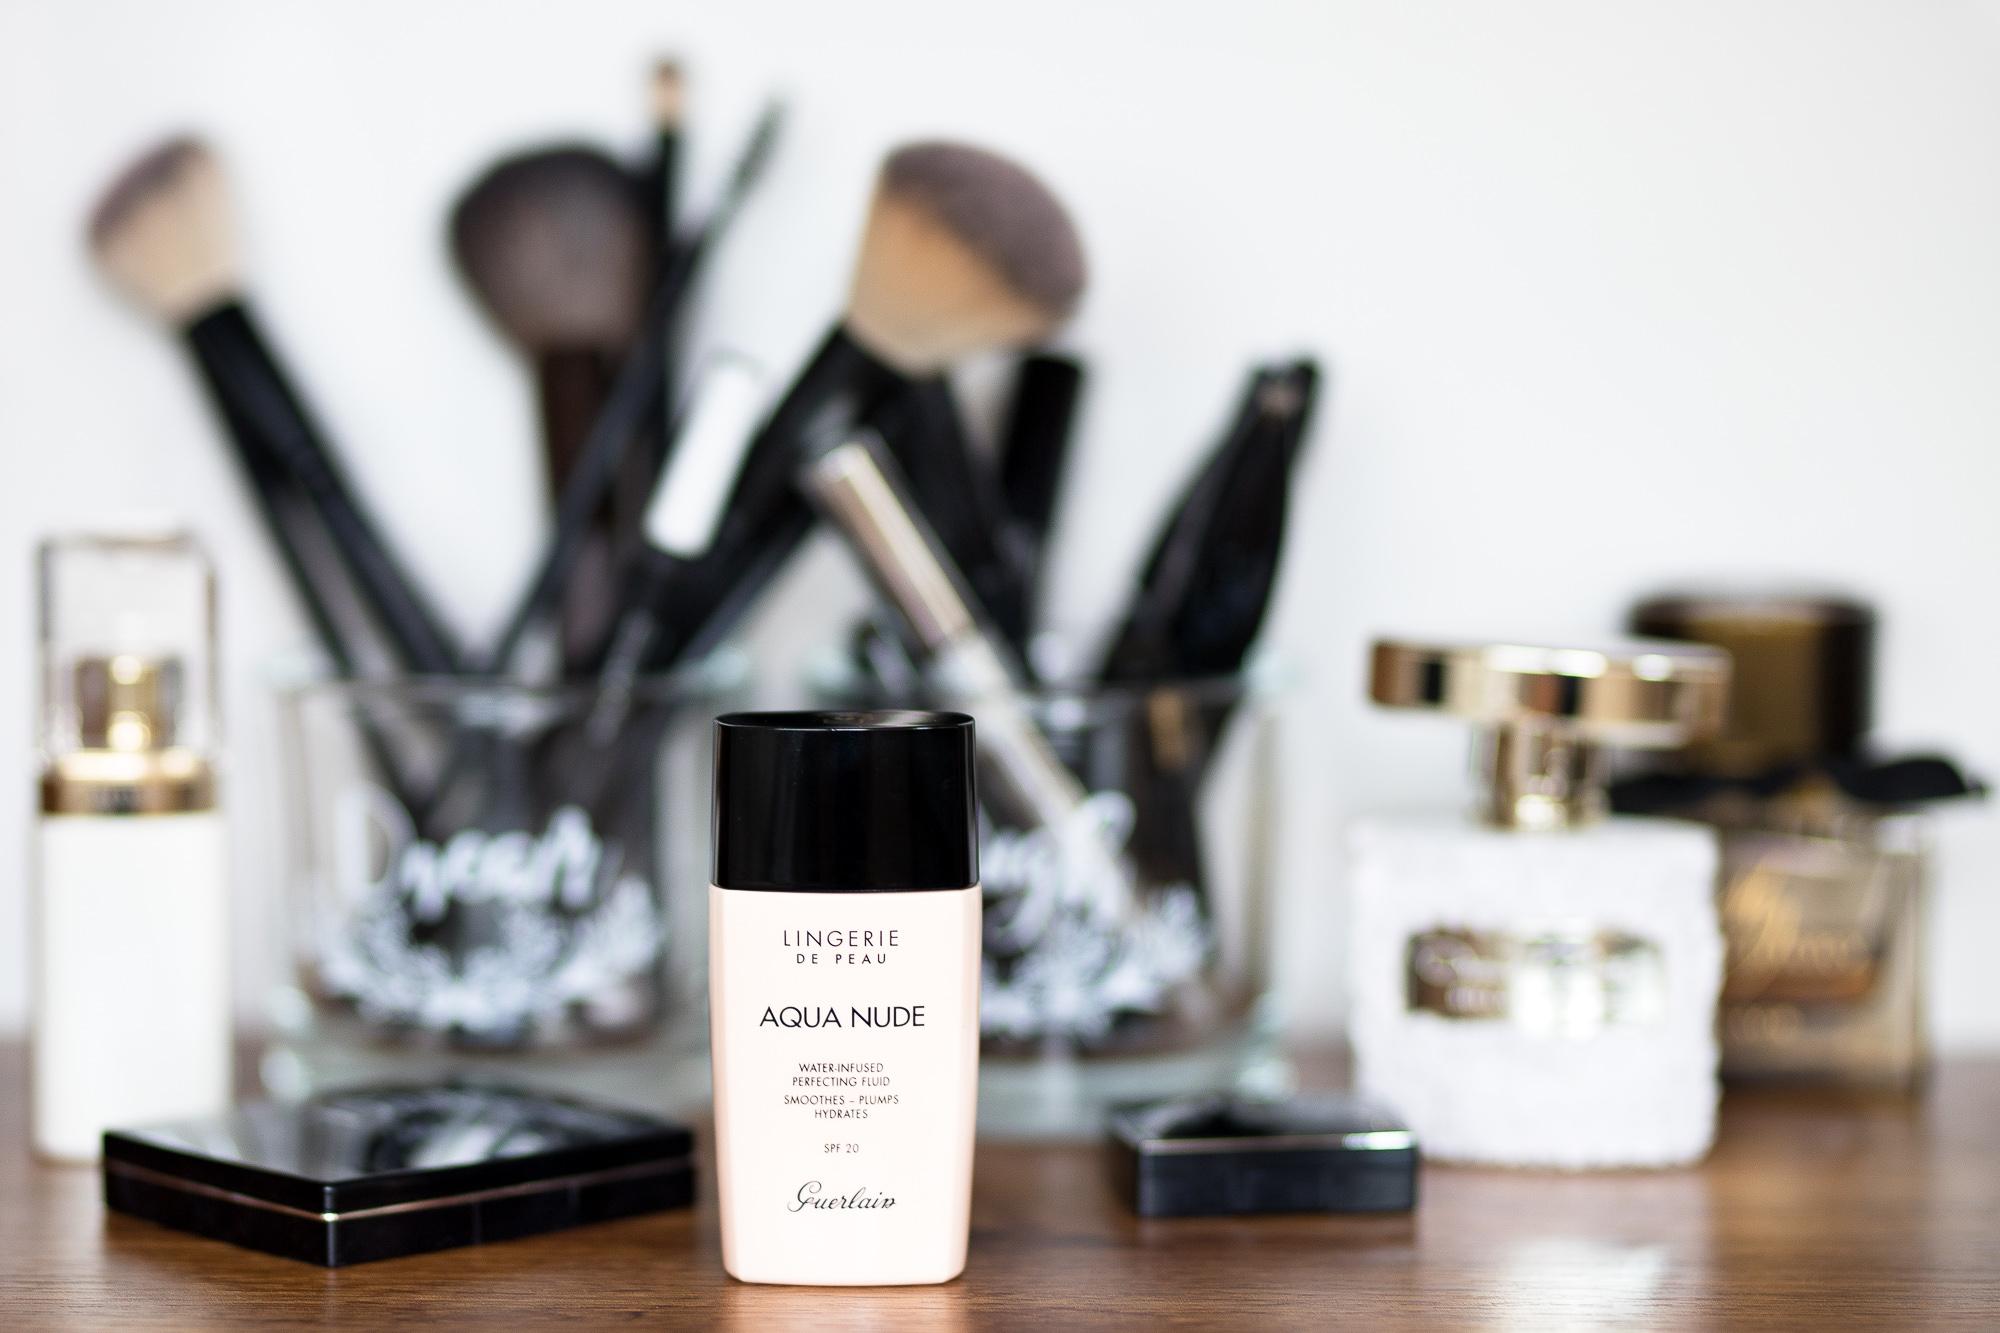 Krémový make up s fialkovou esenciou od Guerlain. Zamilujete si ho!